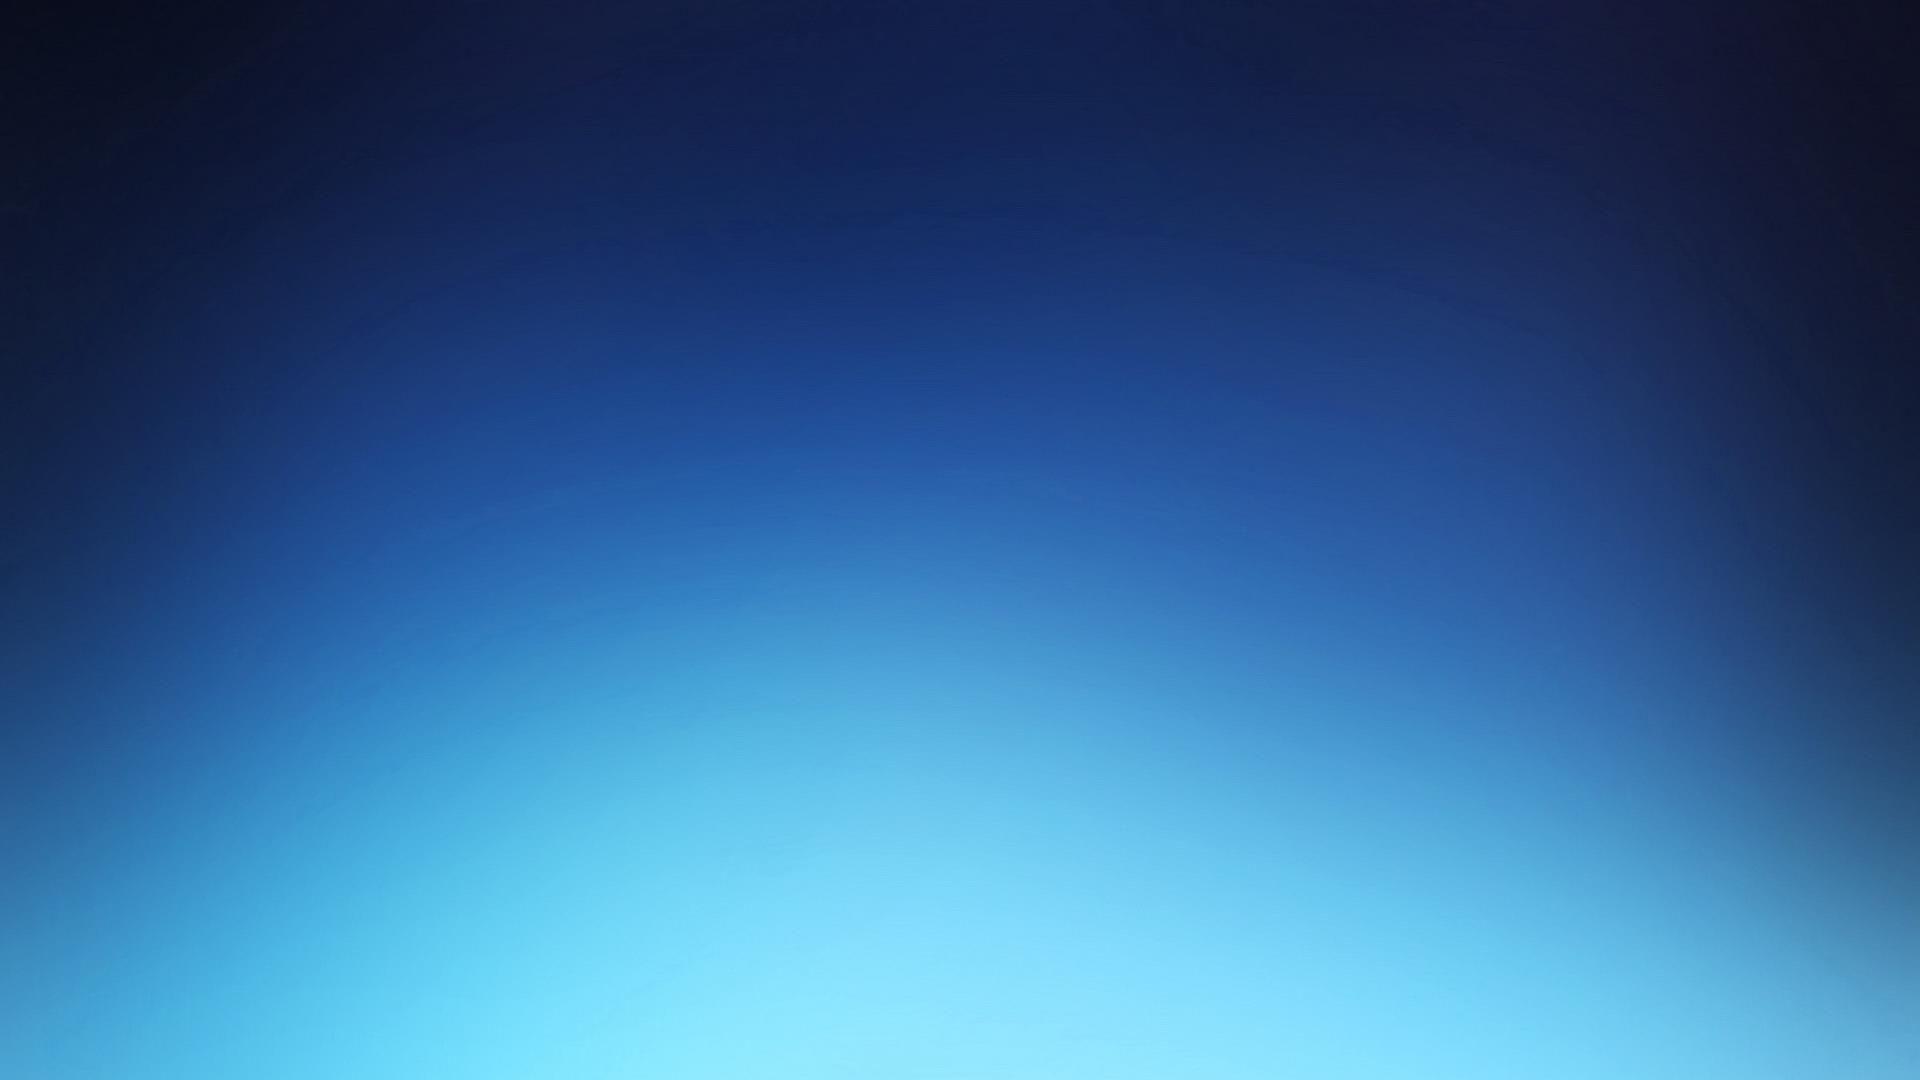 Blue Gradient Background Wallpaper Blue Background Wallpaper